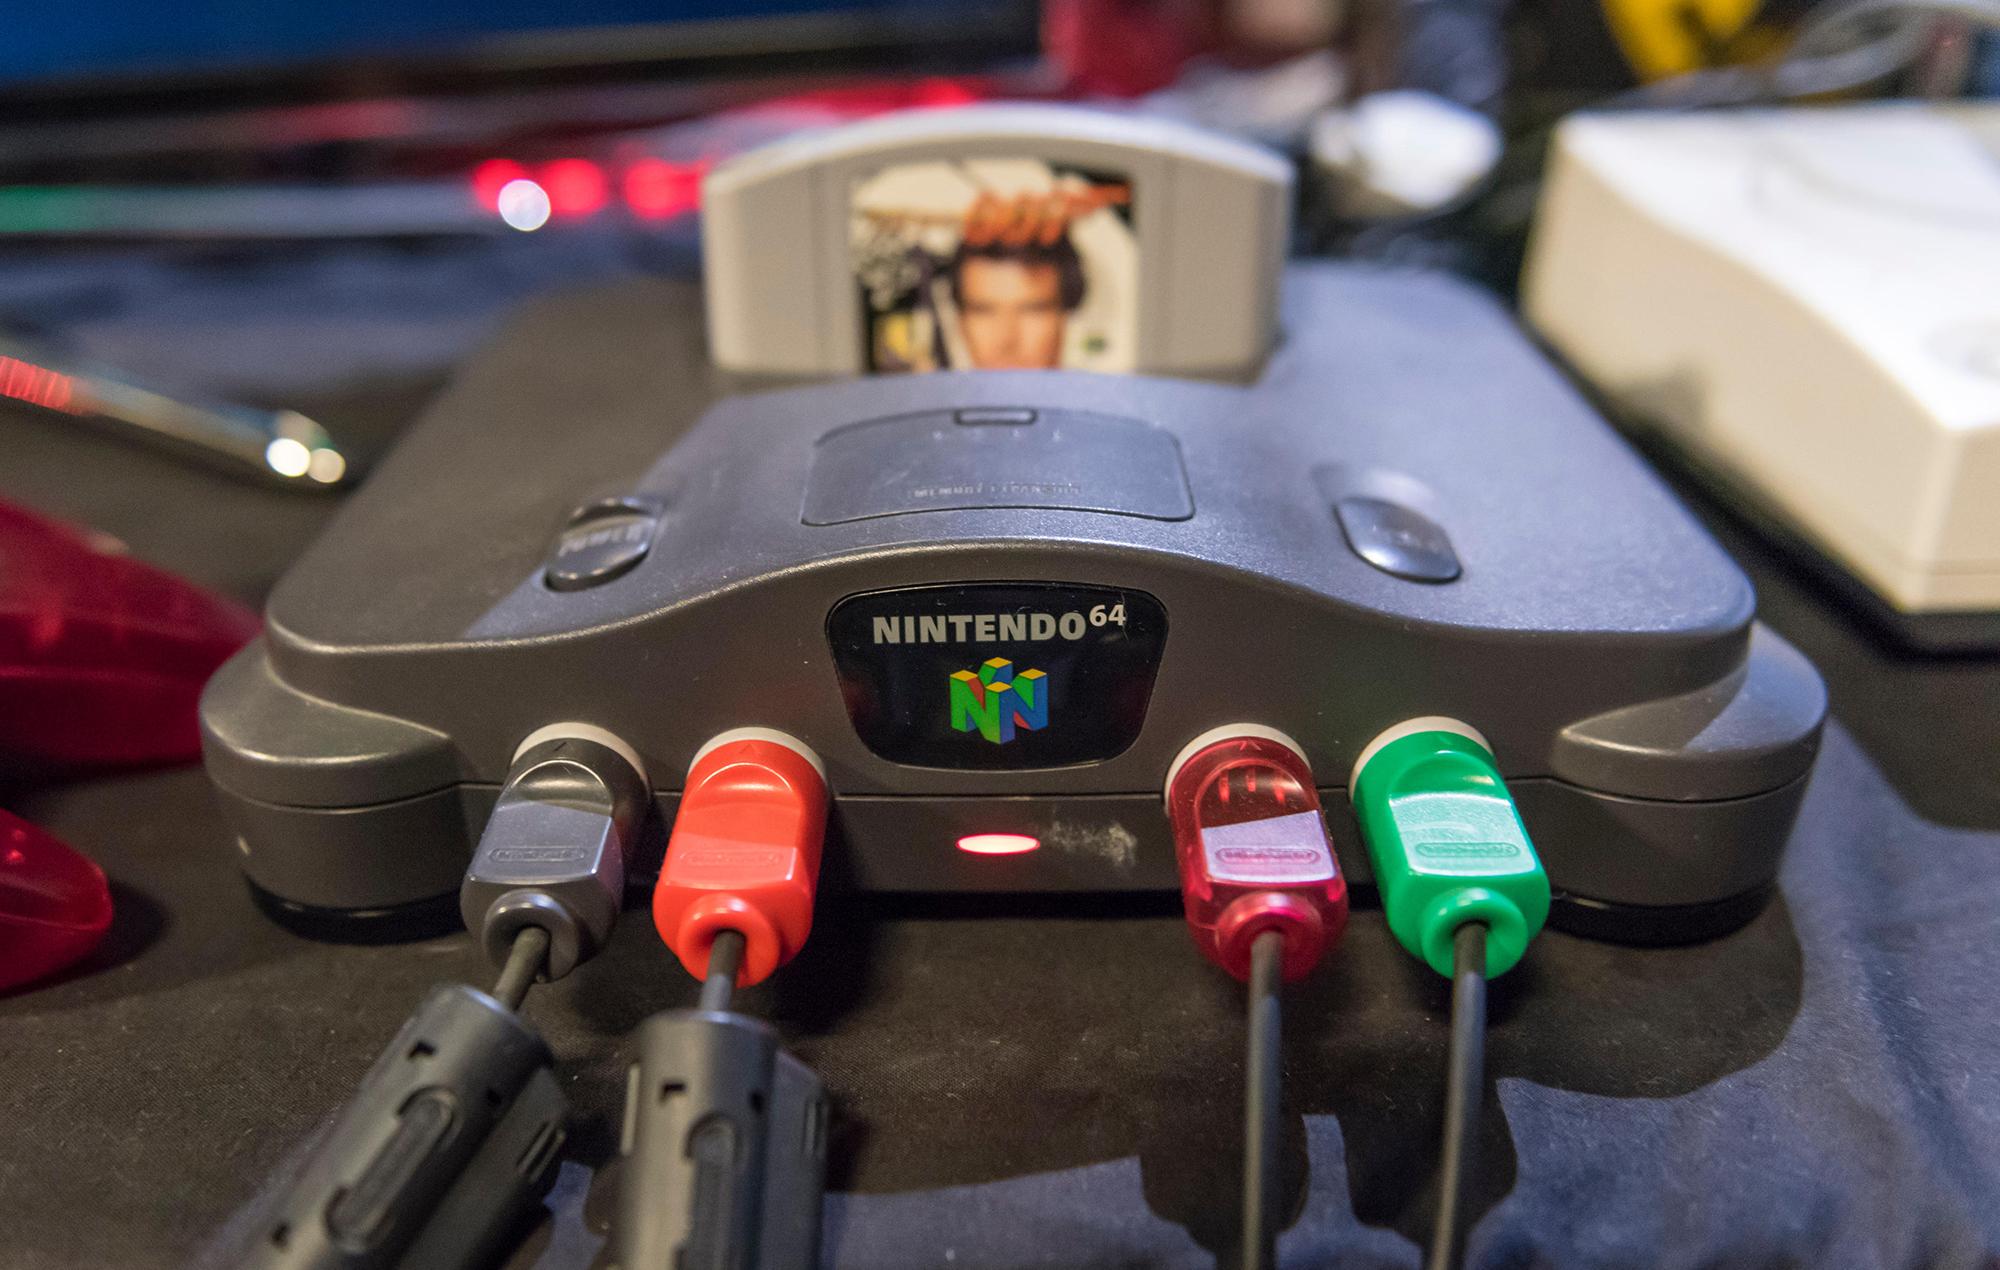 Nintendo 64 system with a goldeneye acrtridge